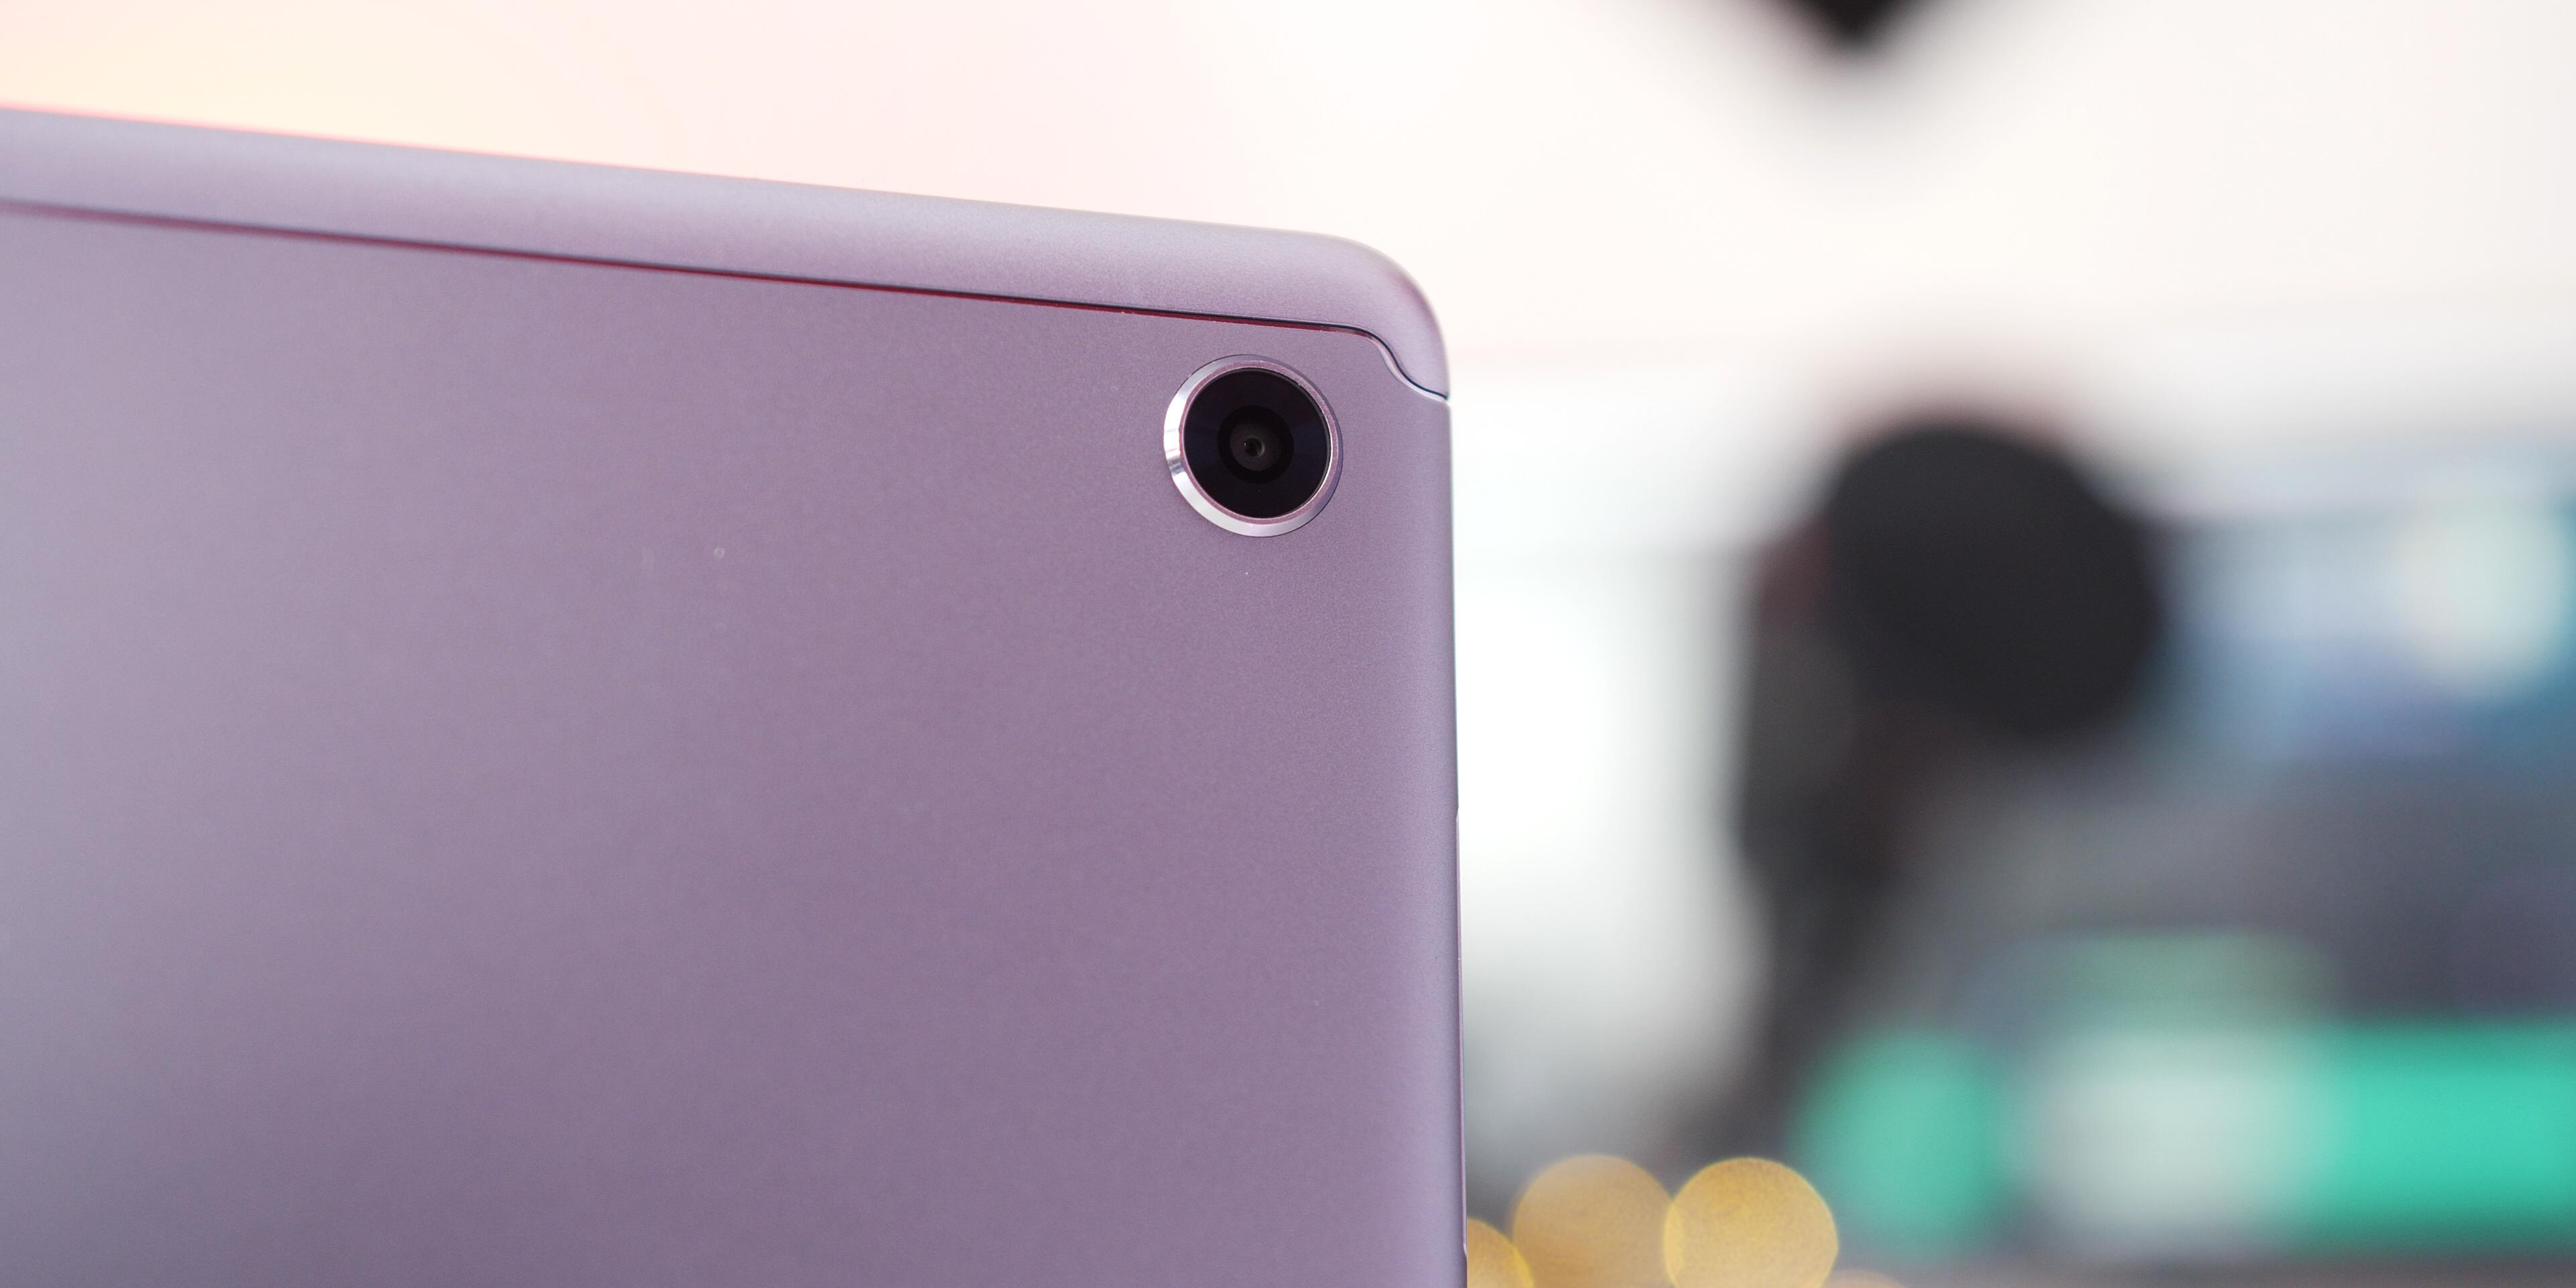 Huawei MediaPad M5 Lite camera